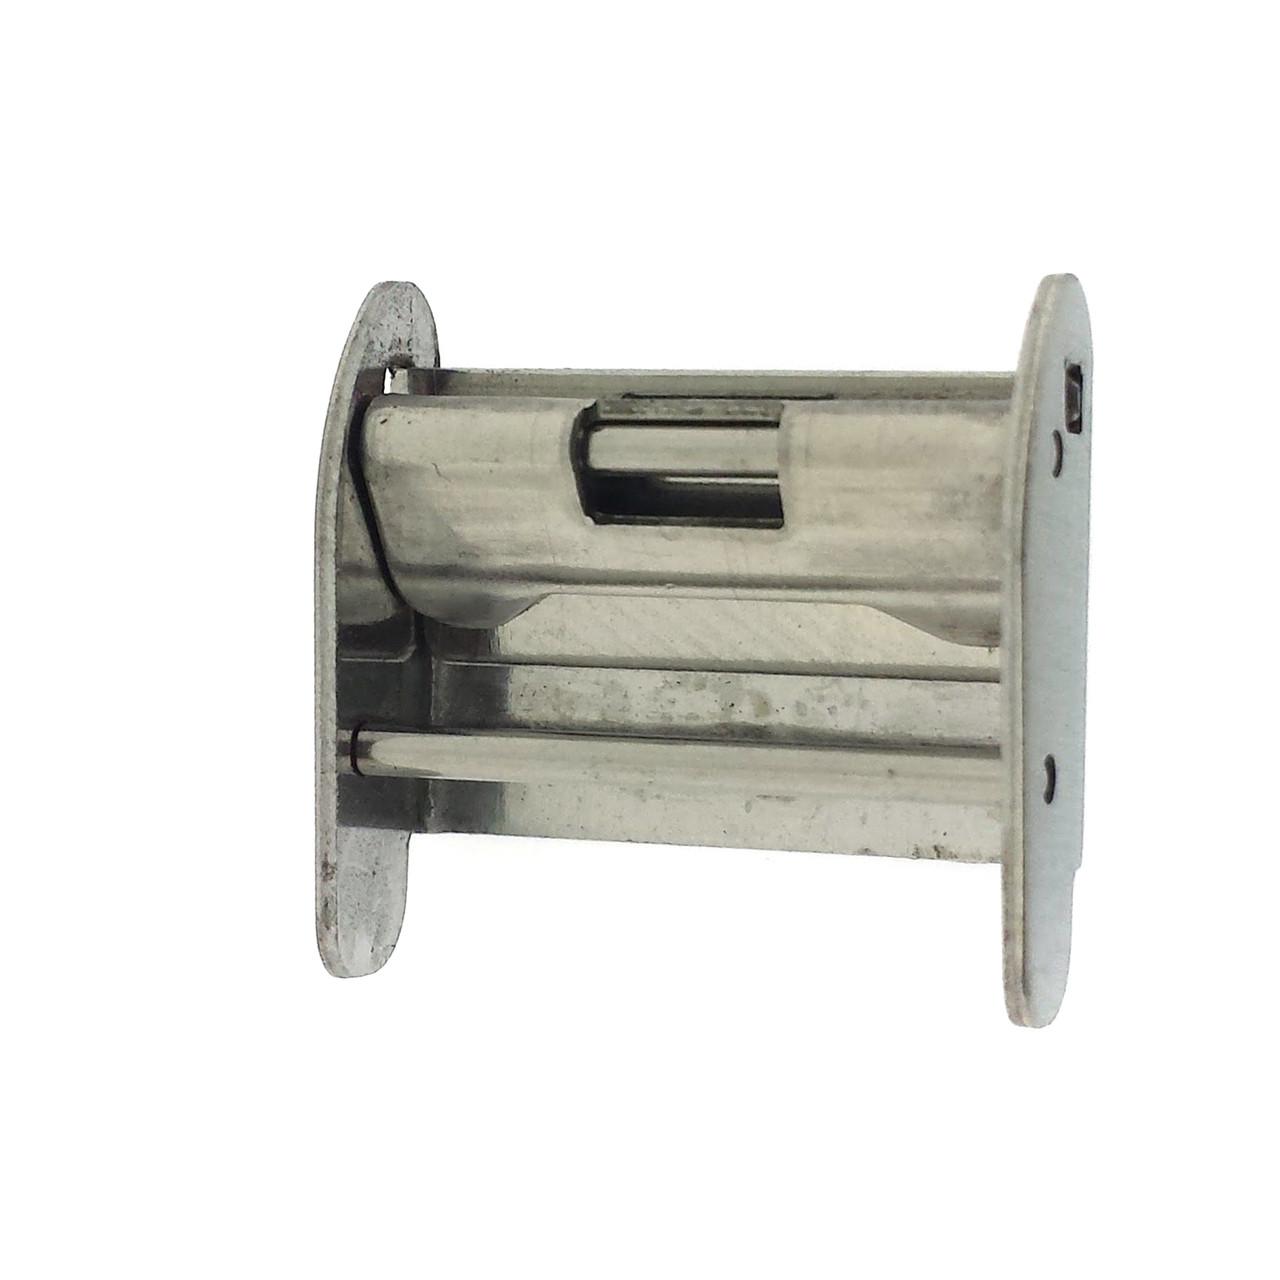 15mm seiko clasp slide